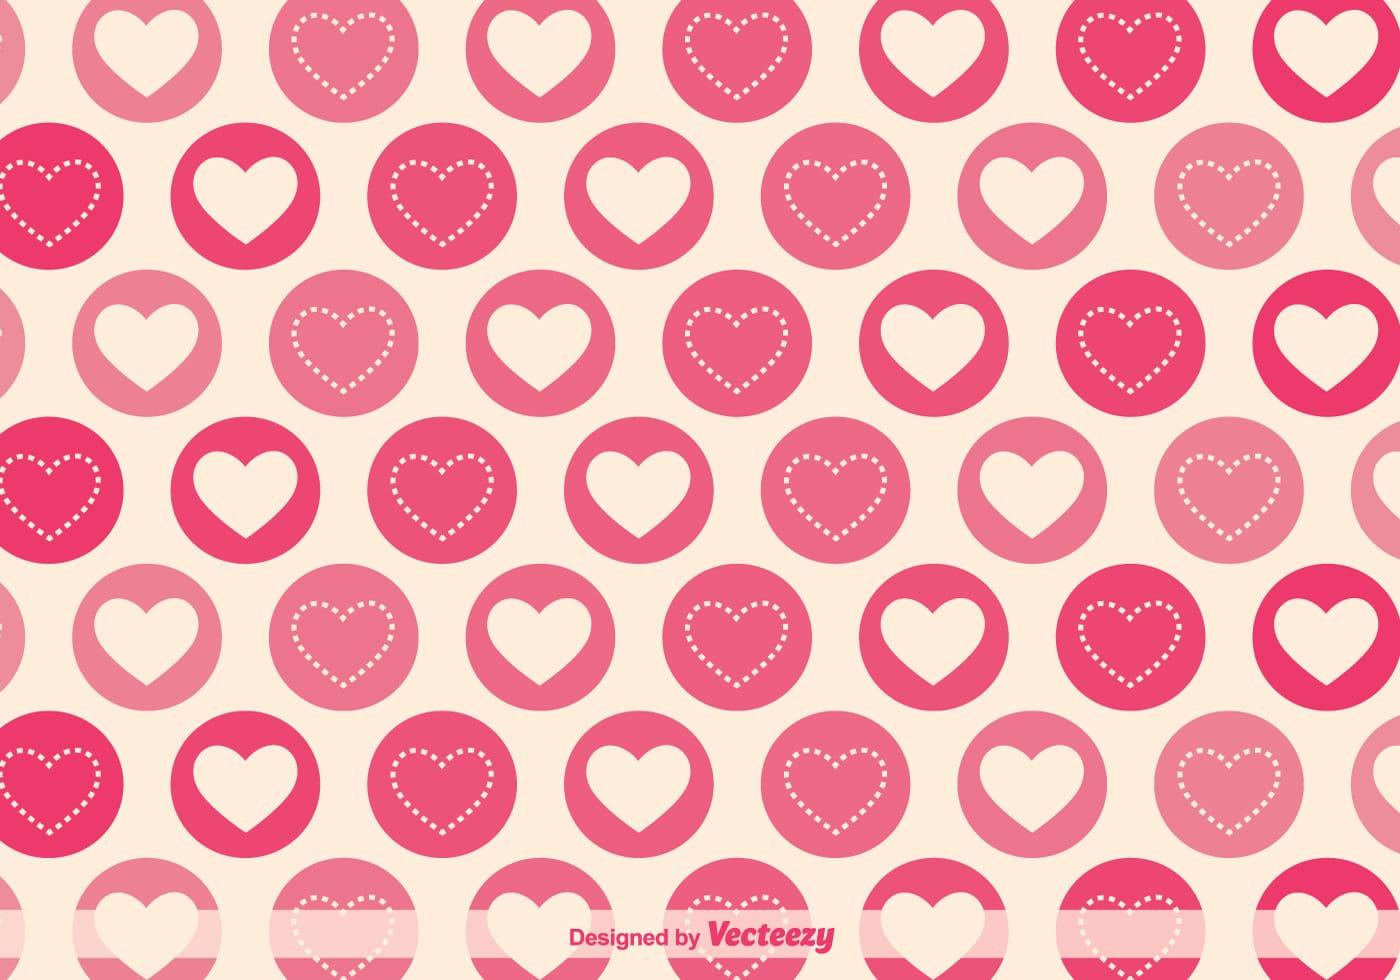 Geometric Hearts Vector Pattern Download Free Vector Art